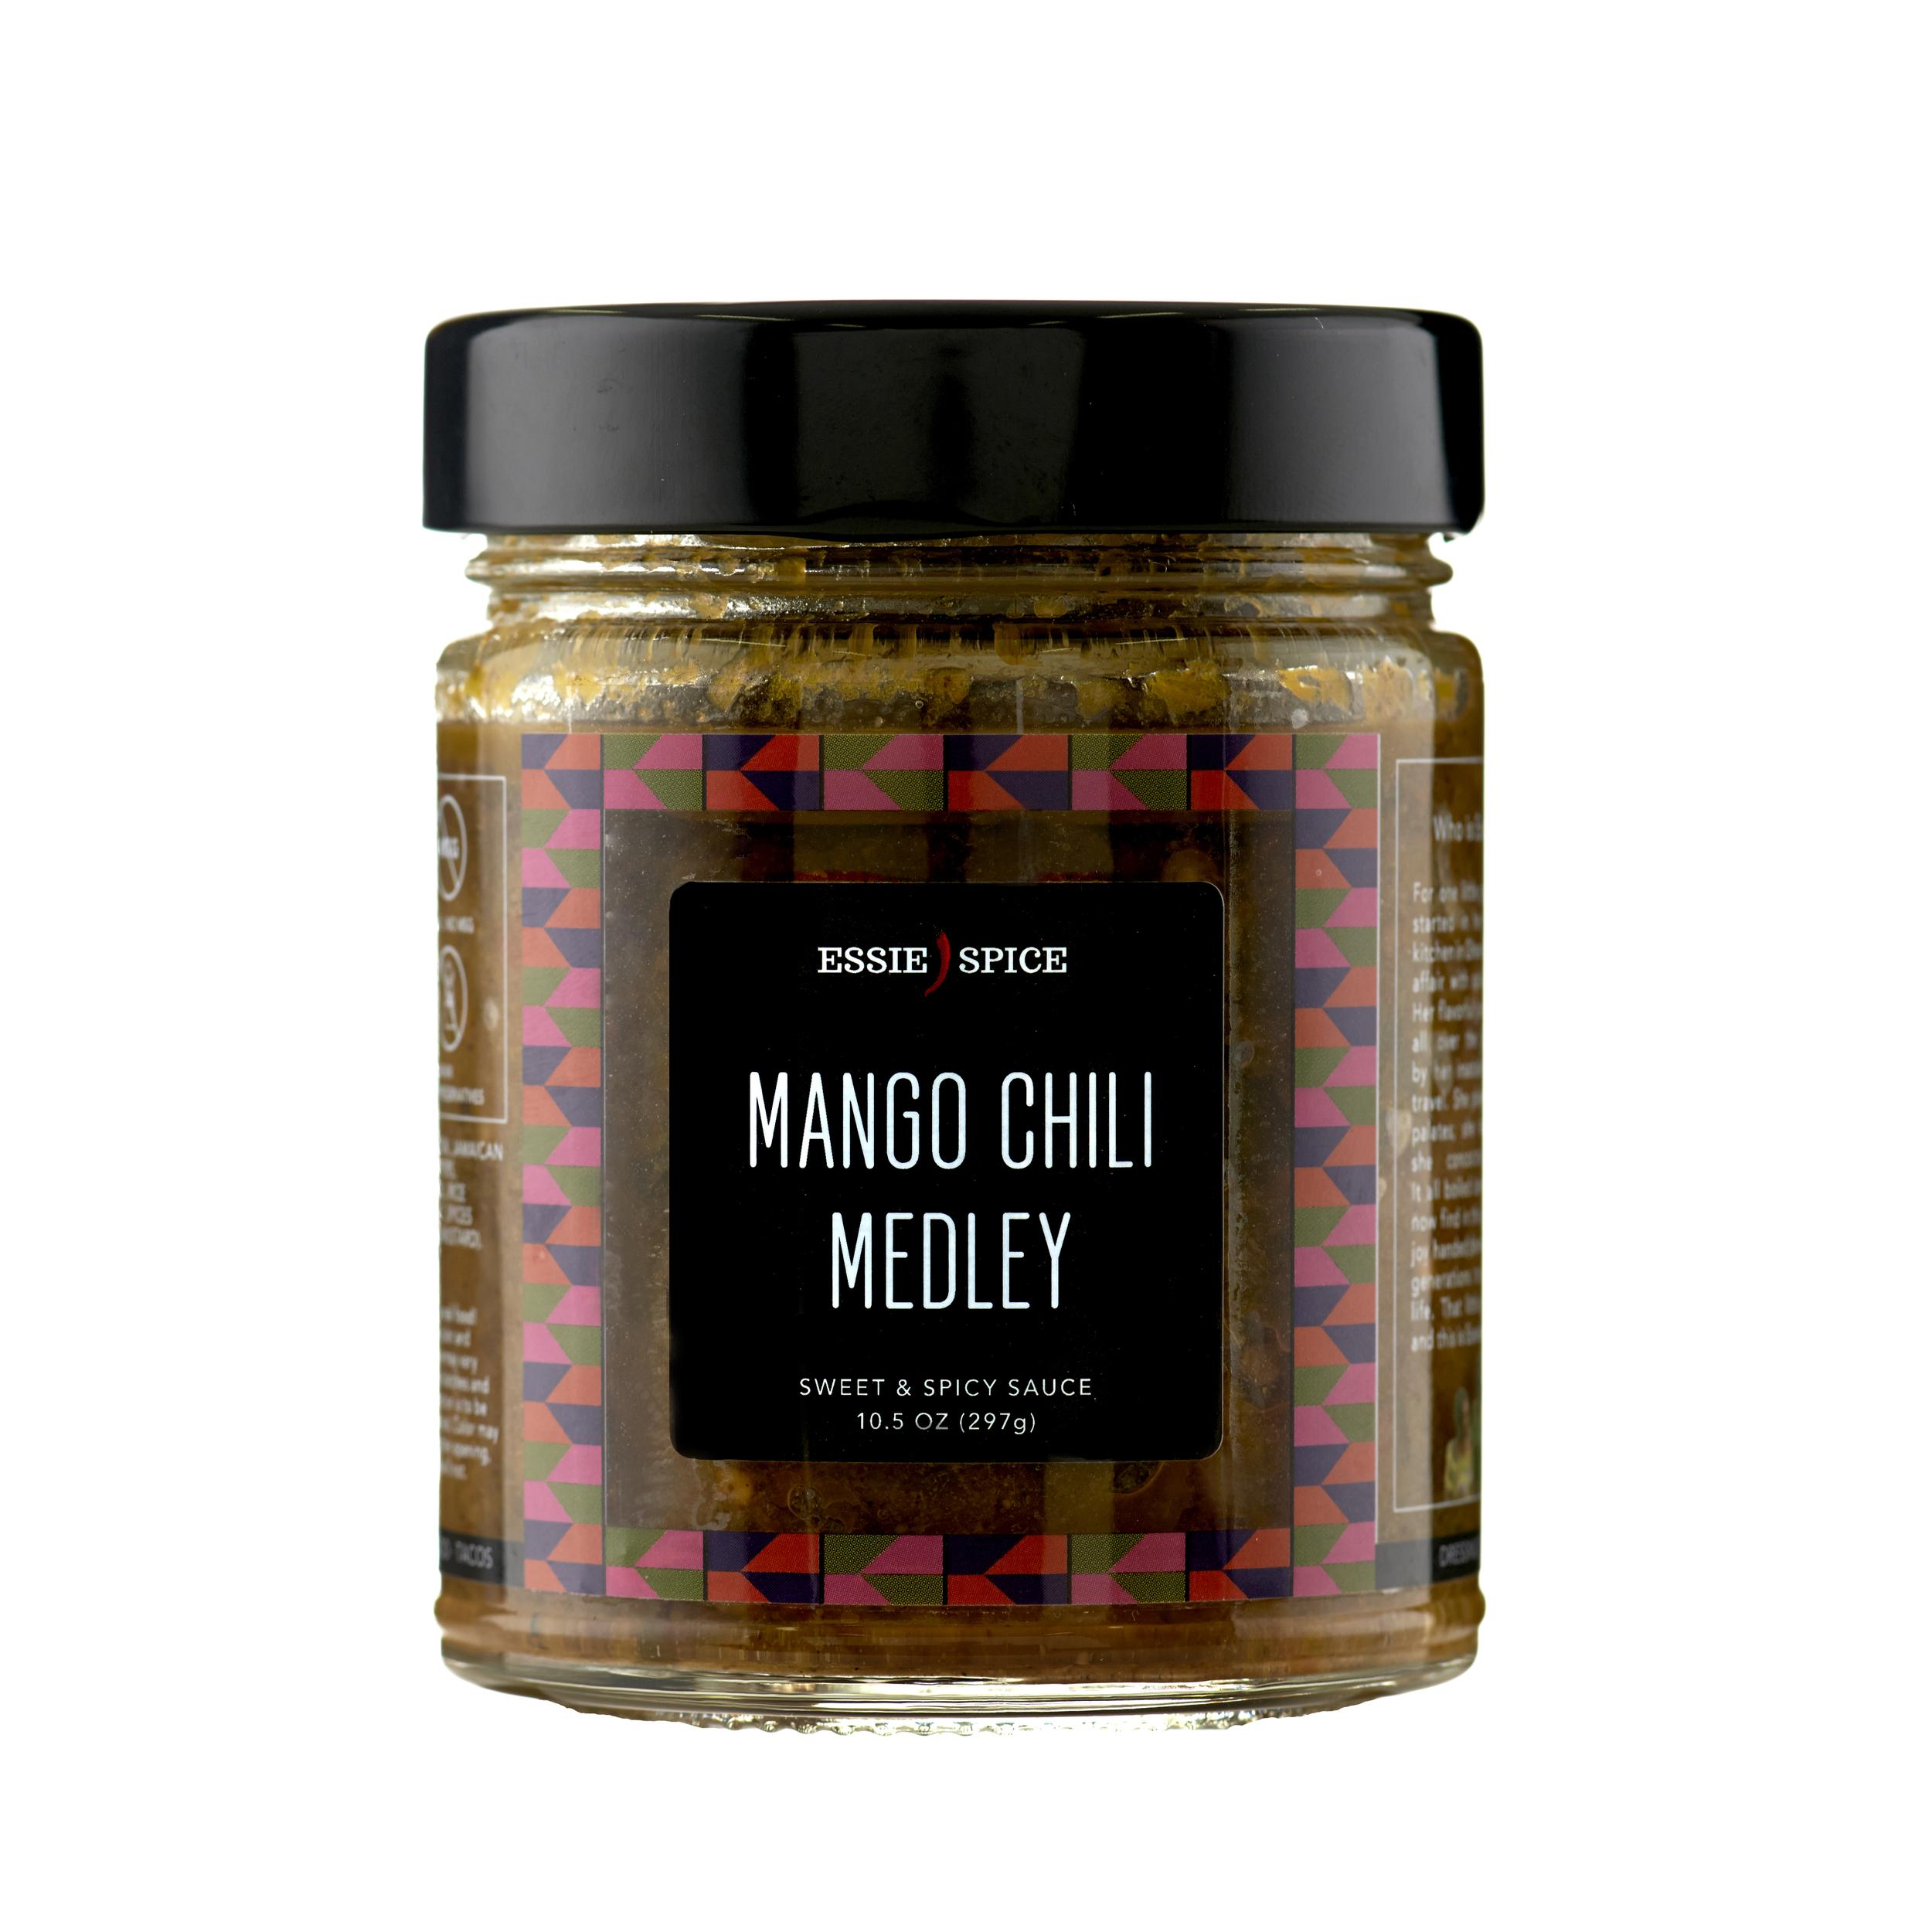 MANGO CHILLI MEDLEY spicy.jpg